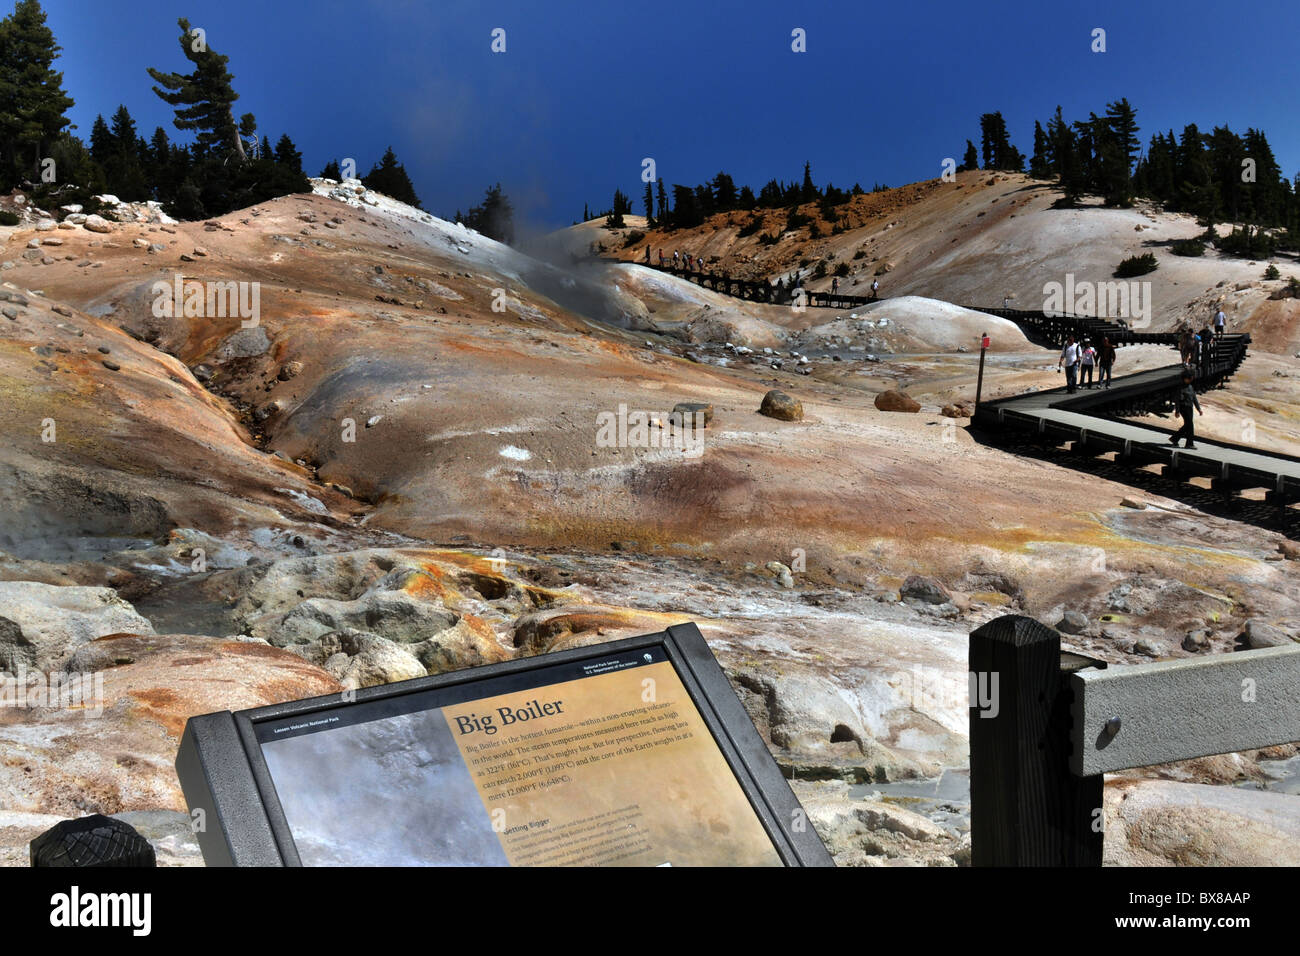 Big Boiler Lassen Volcanic  National Park, California USA - Stock Image